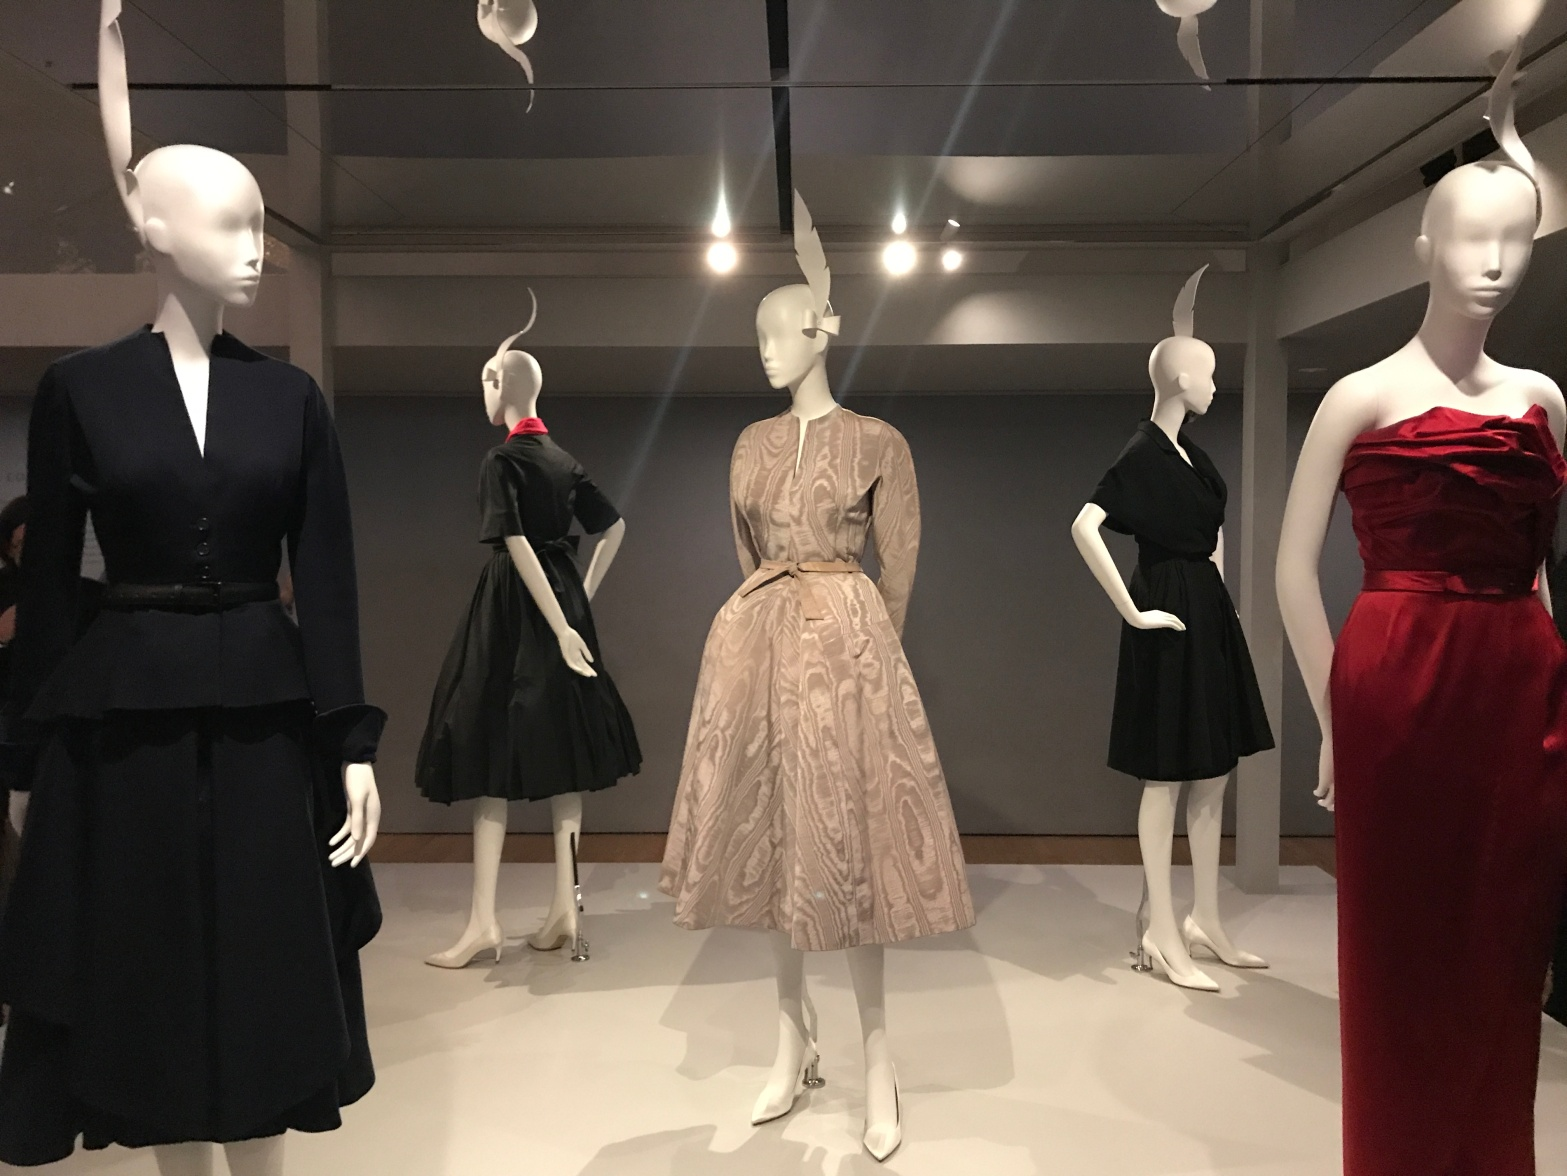 Christian Dior fashion dresses